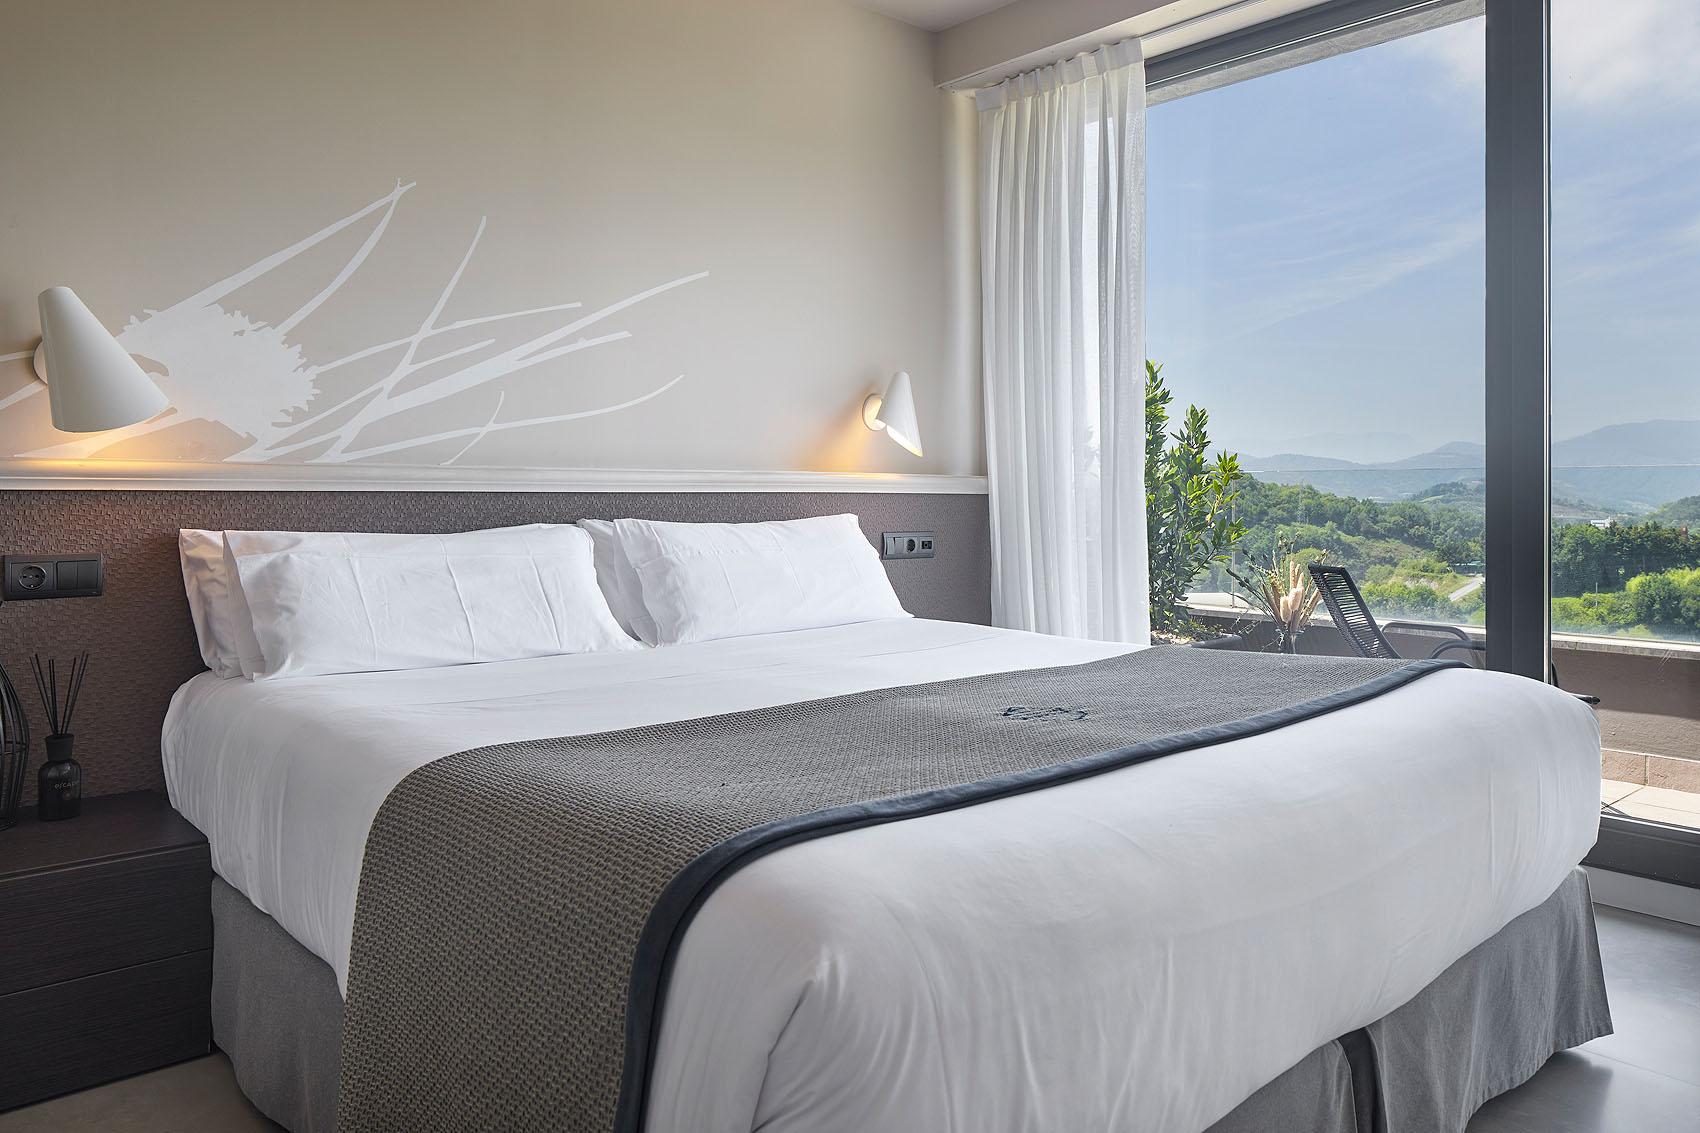 Irenaz Resort  en San Sebastian - Iñaki Caperochipi - Fotografía